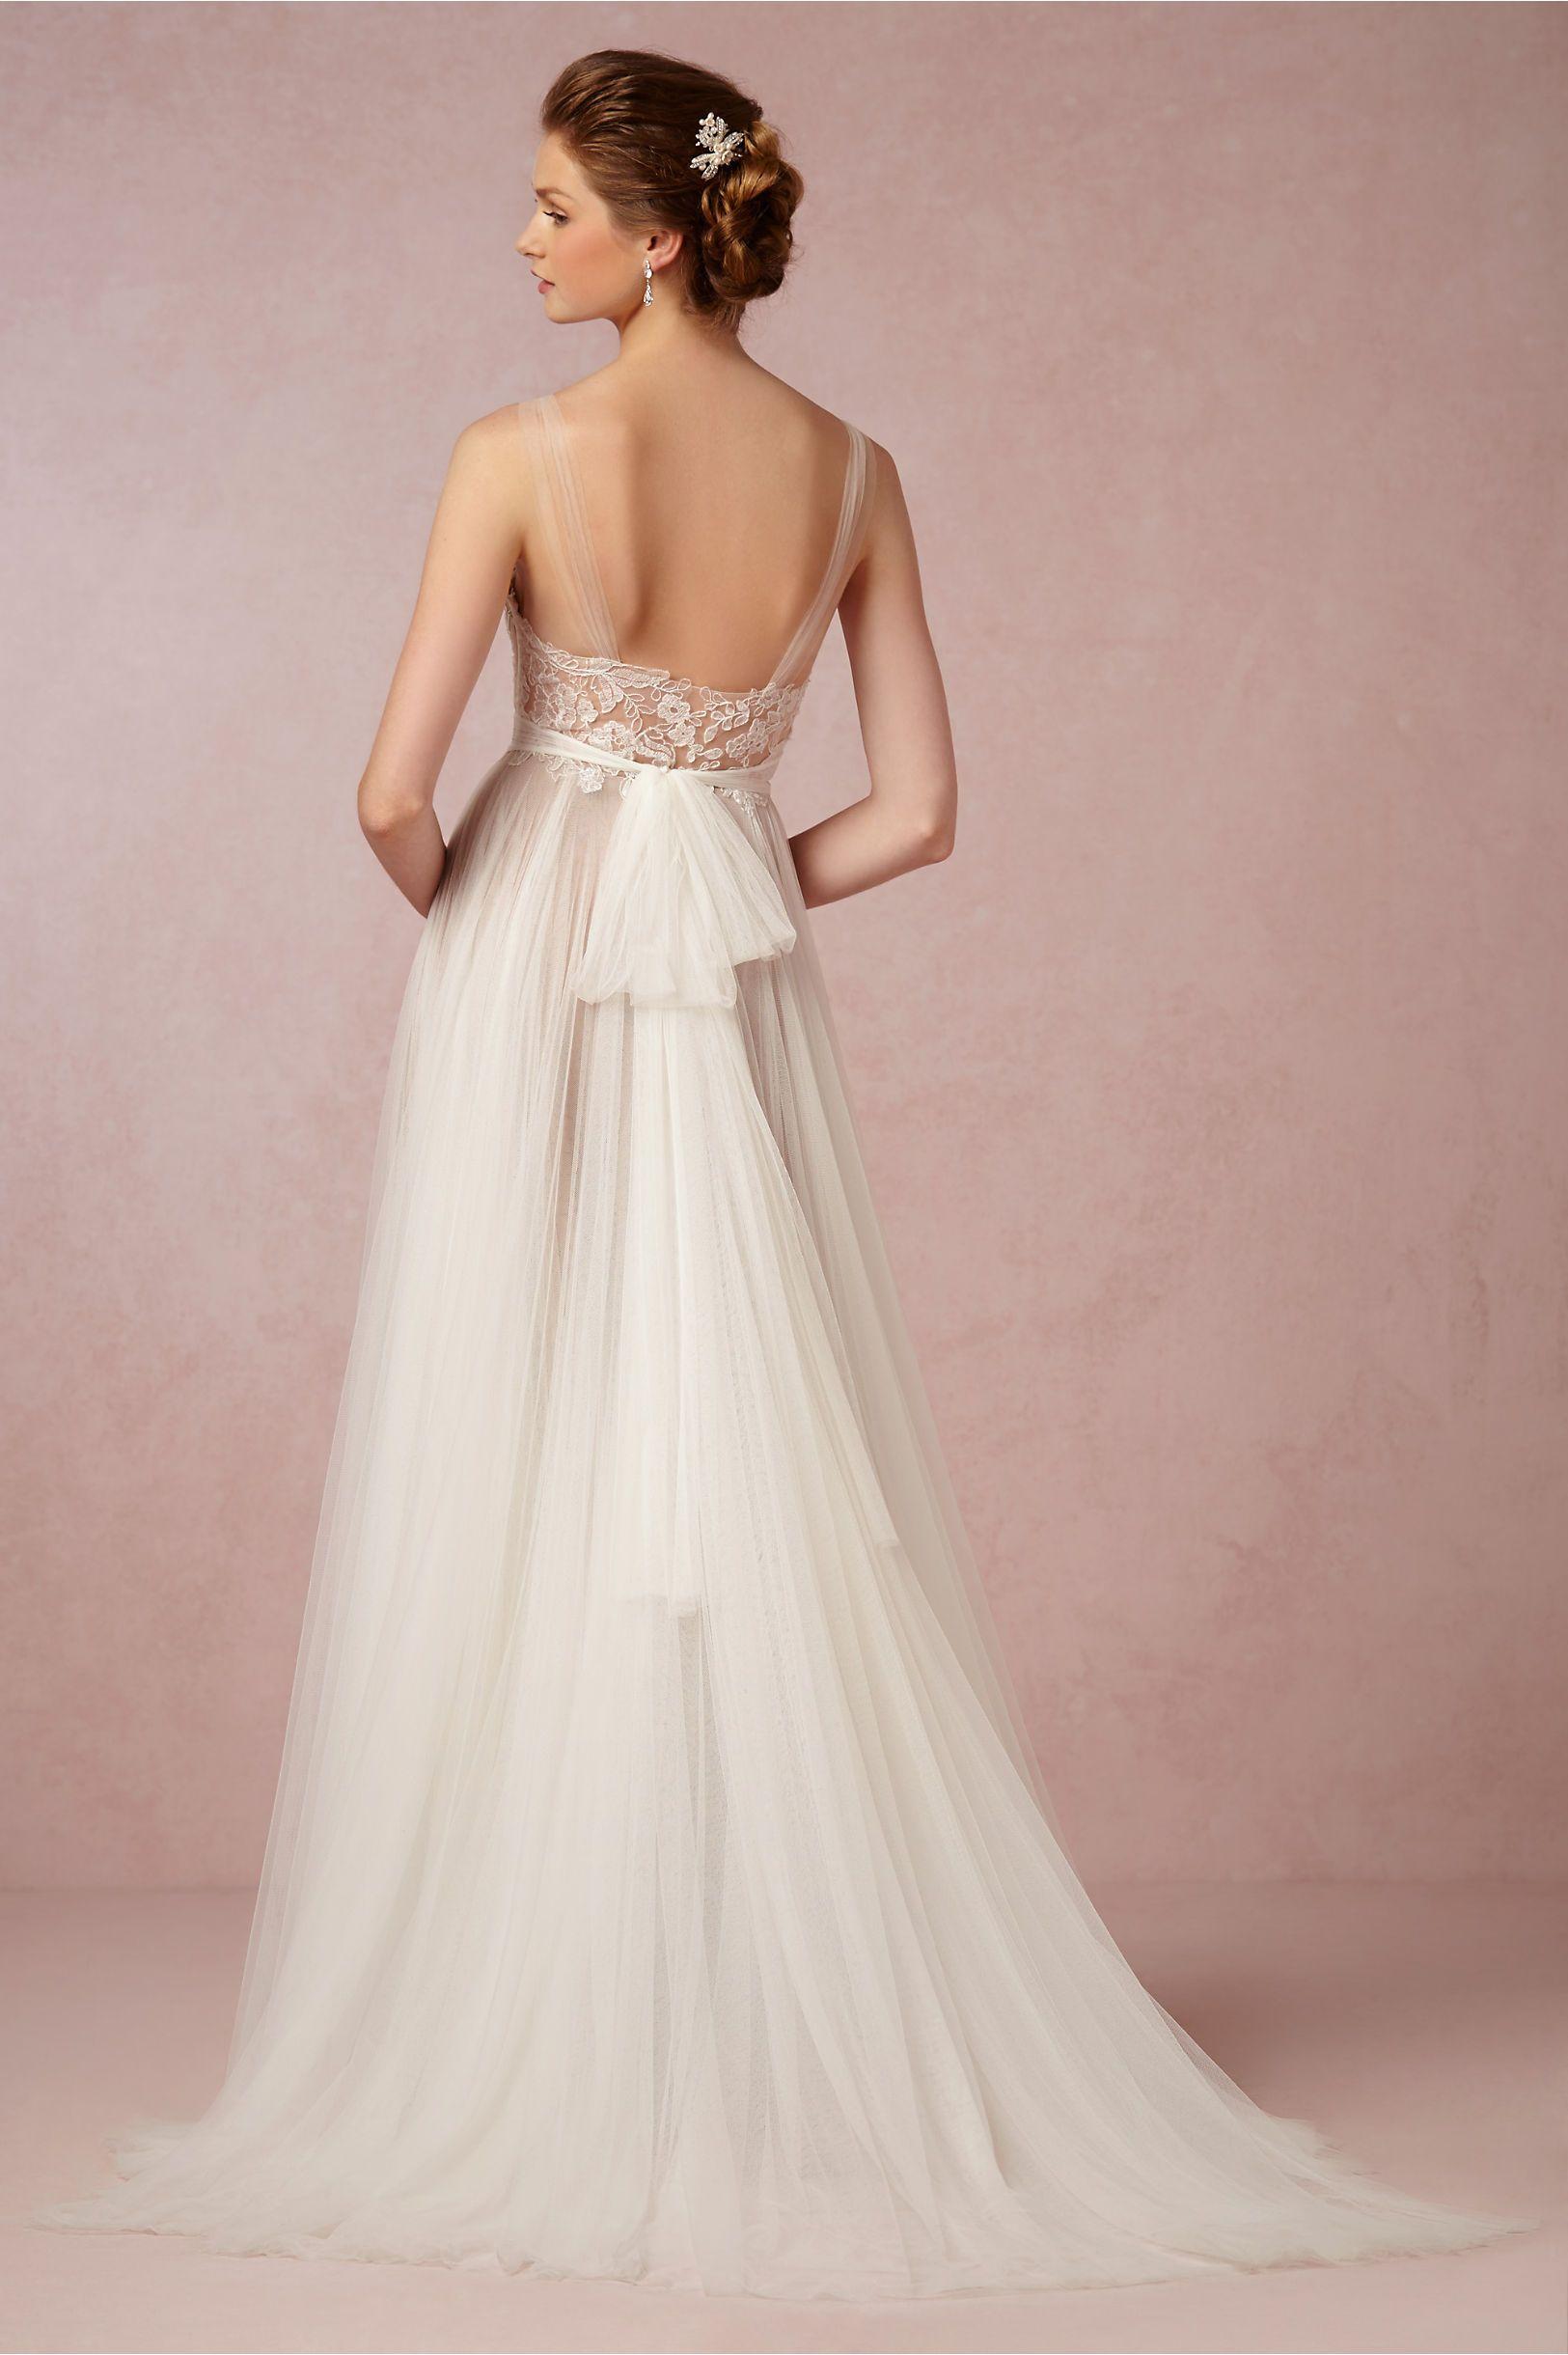 Sheer Neck Simple Tulle Lace Sheath Wedding Dresses Applique ...